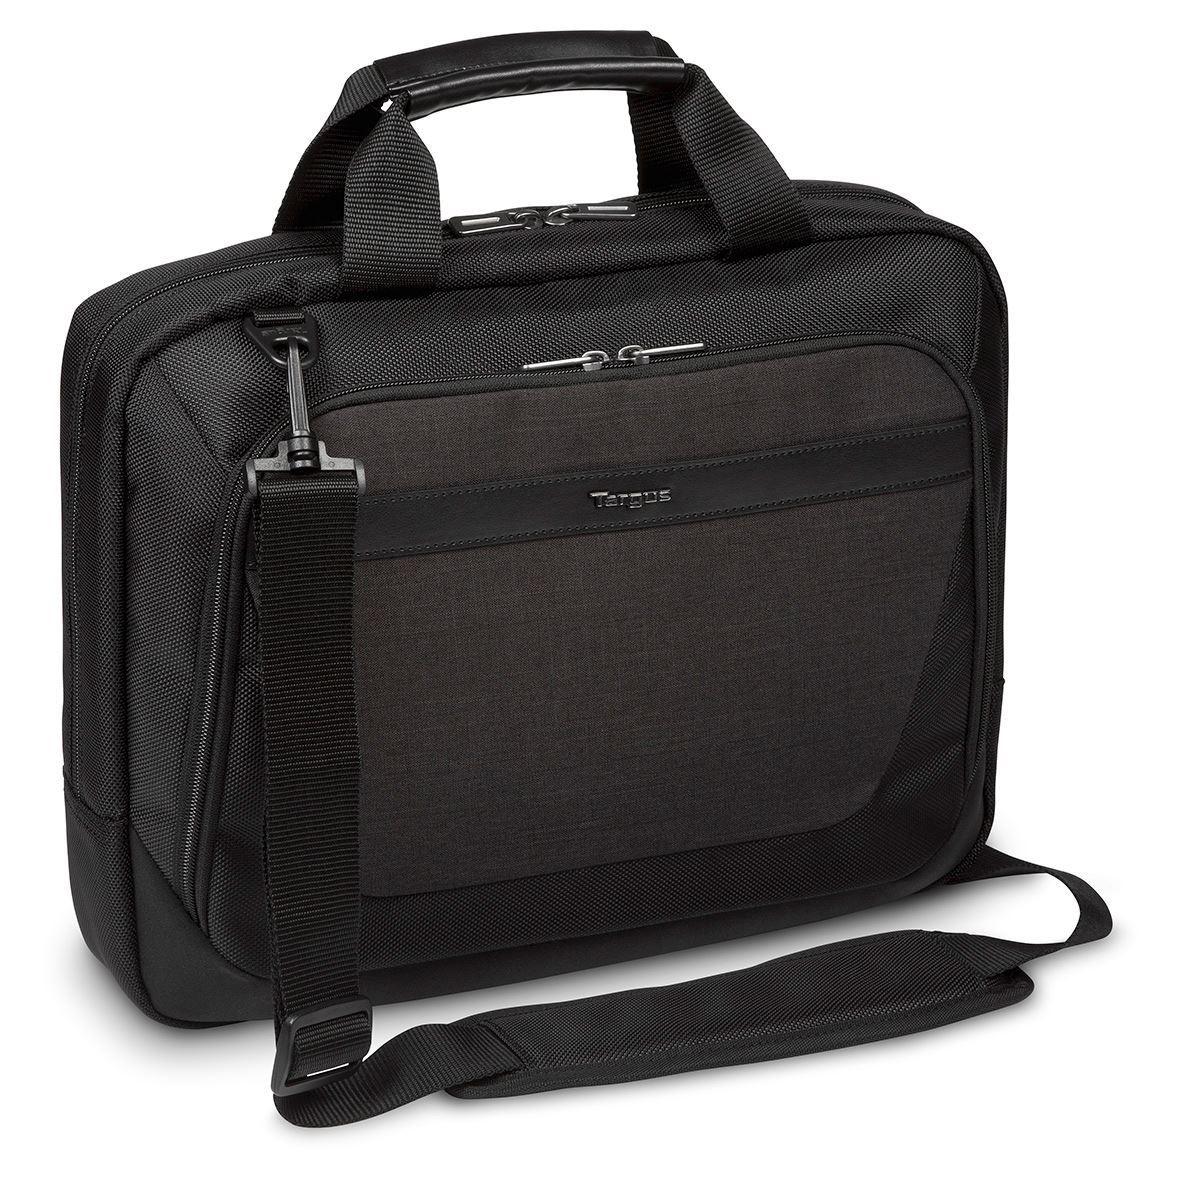 "CitySmart 12-14"" Slimline Topload Laptop Case Czarny\Szary"